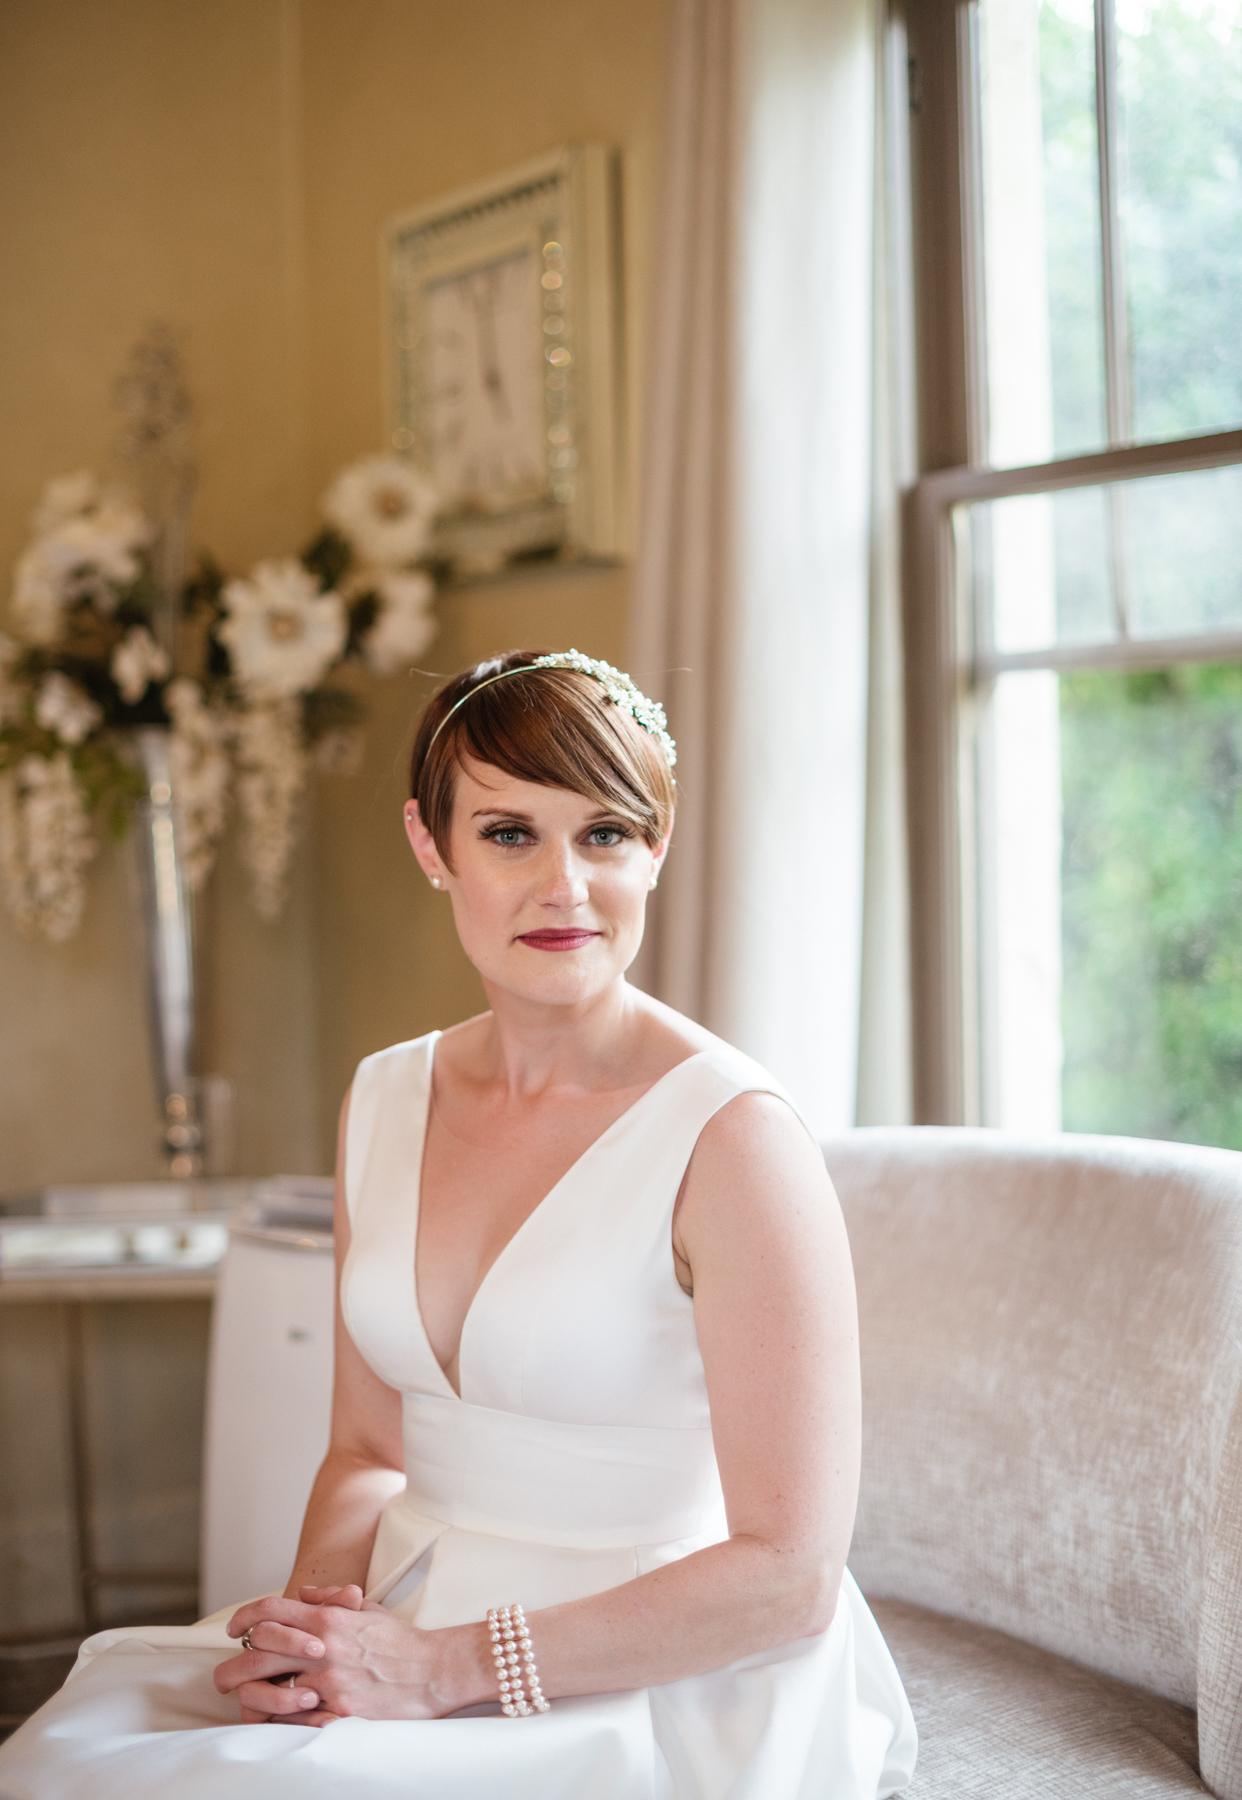 Secret Garden Event Center Wedding - Meredith Amadee Photography-22-2.jpg